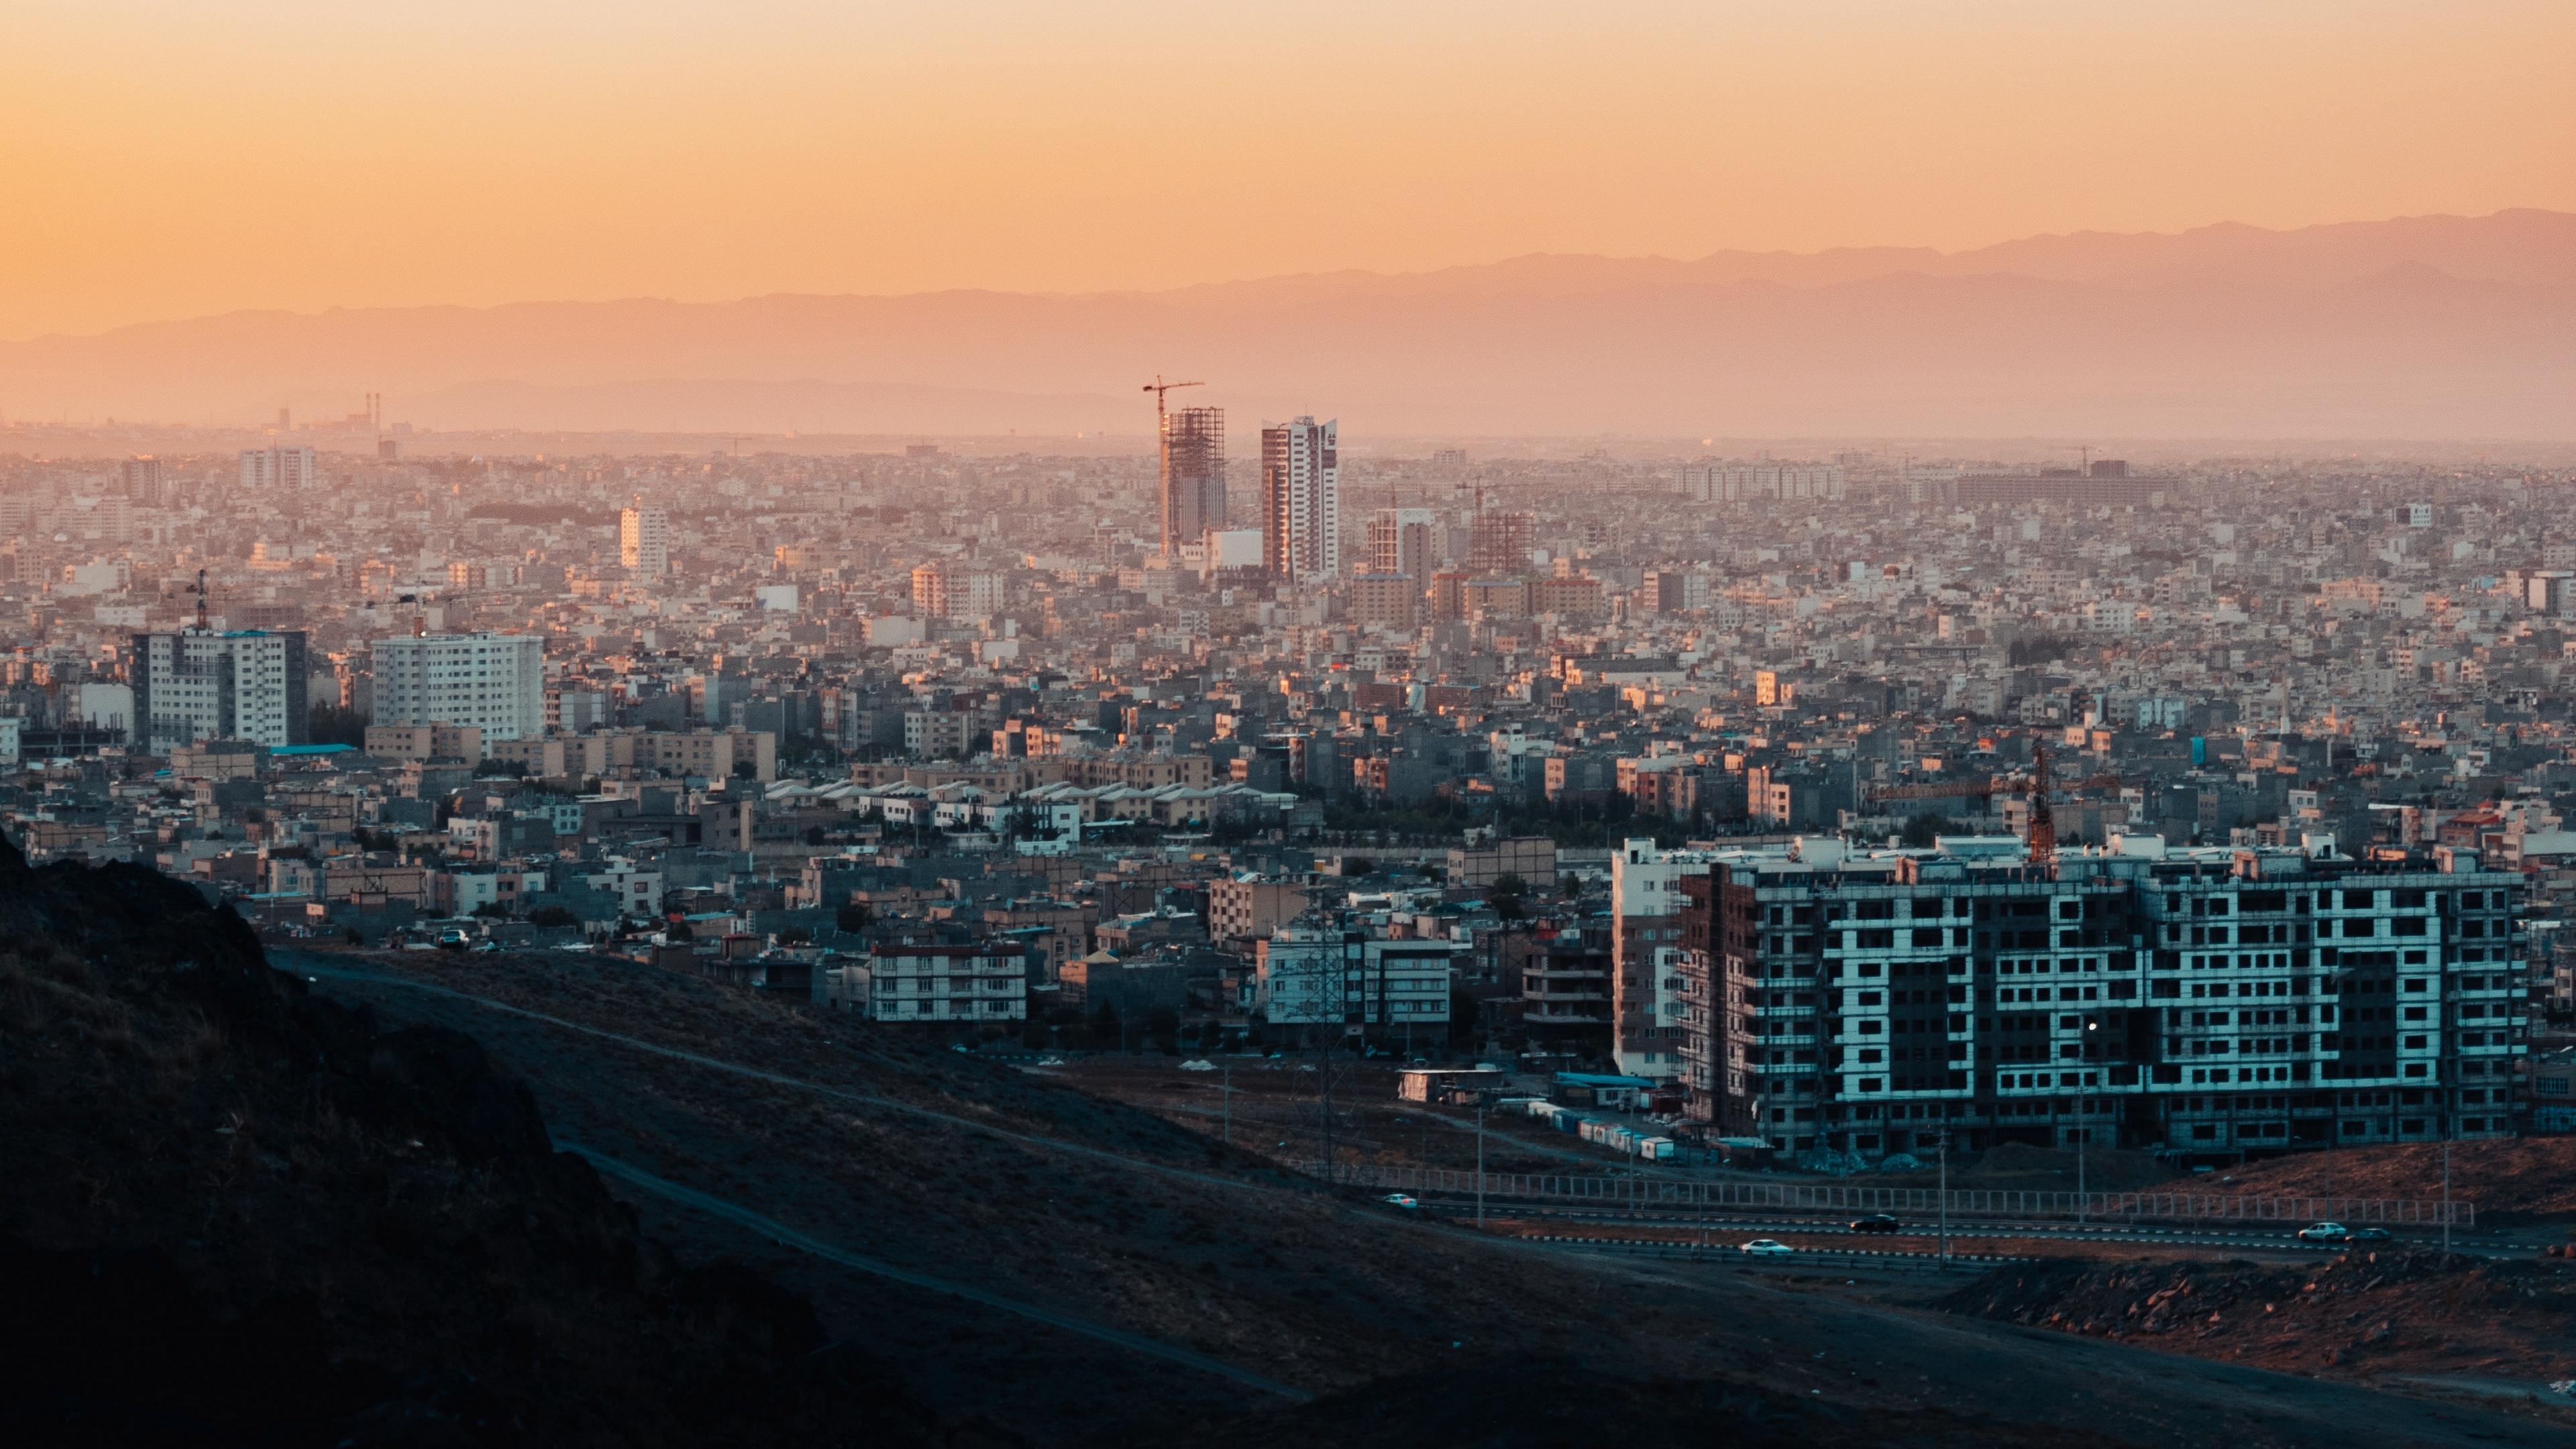 city buildings sunset mashhad iran 4k 1538066694 - city, buildings, sunset, mashhad, iran 4k - sunset, City, buildings